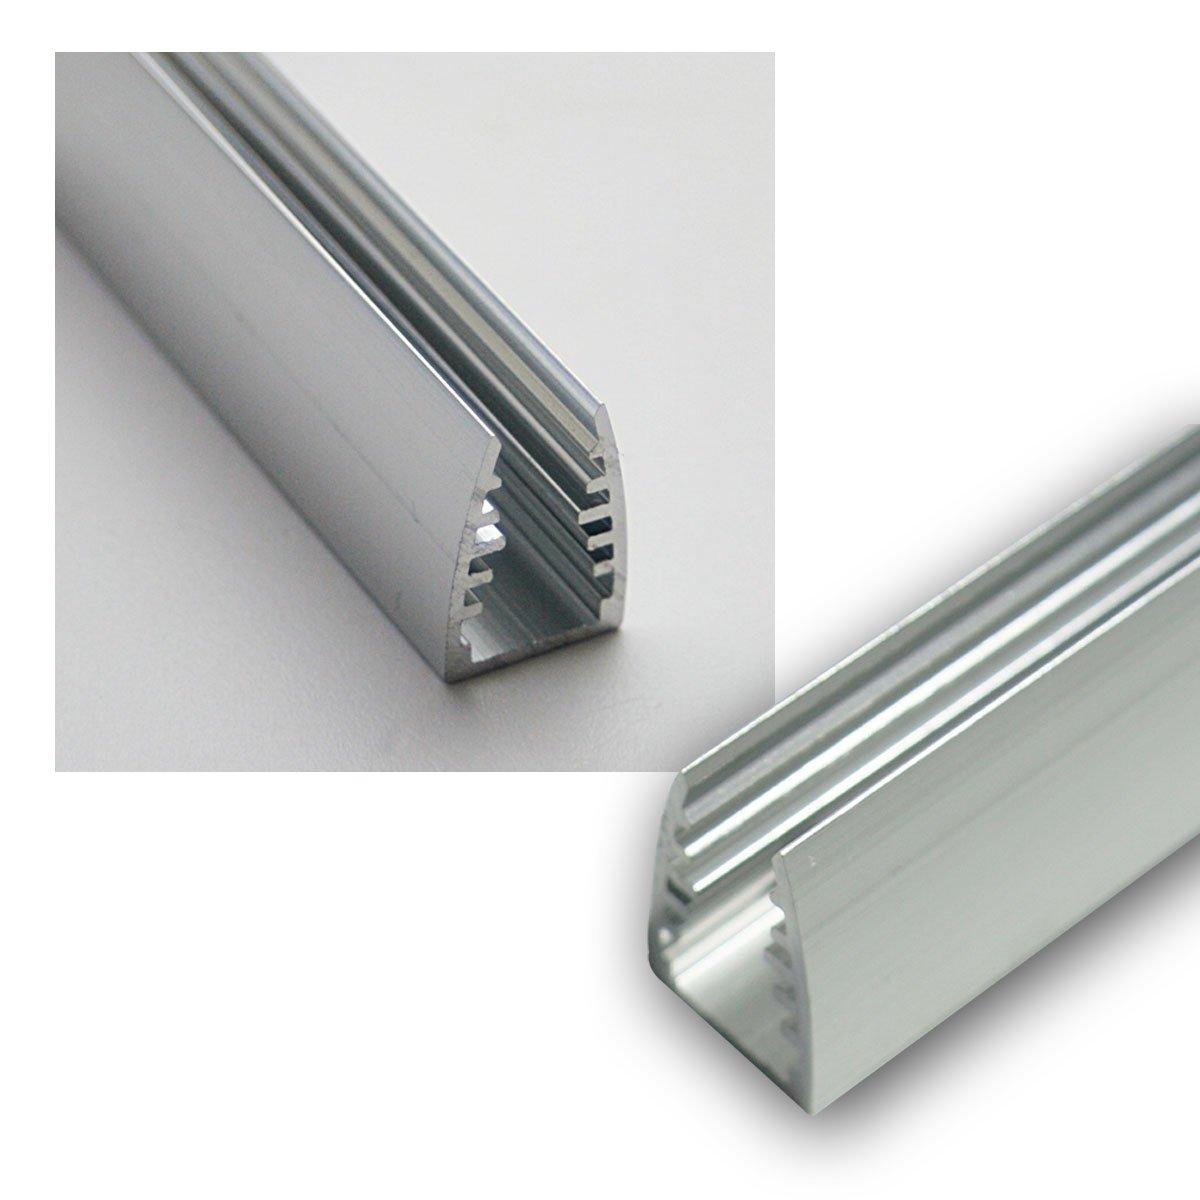 1m LED Alu-Glaskanten-Profil eloxiert, 12,5x18mm world-trading-net